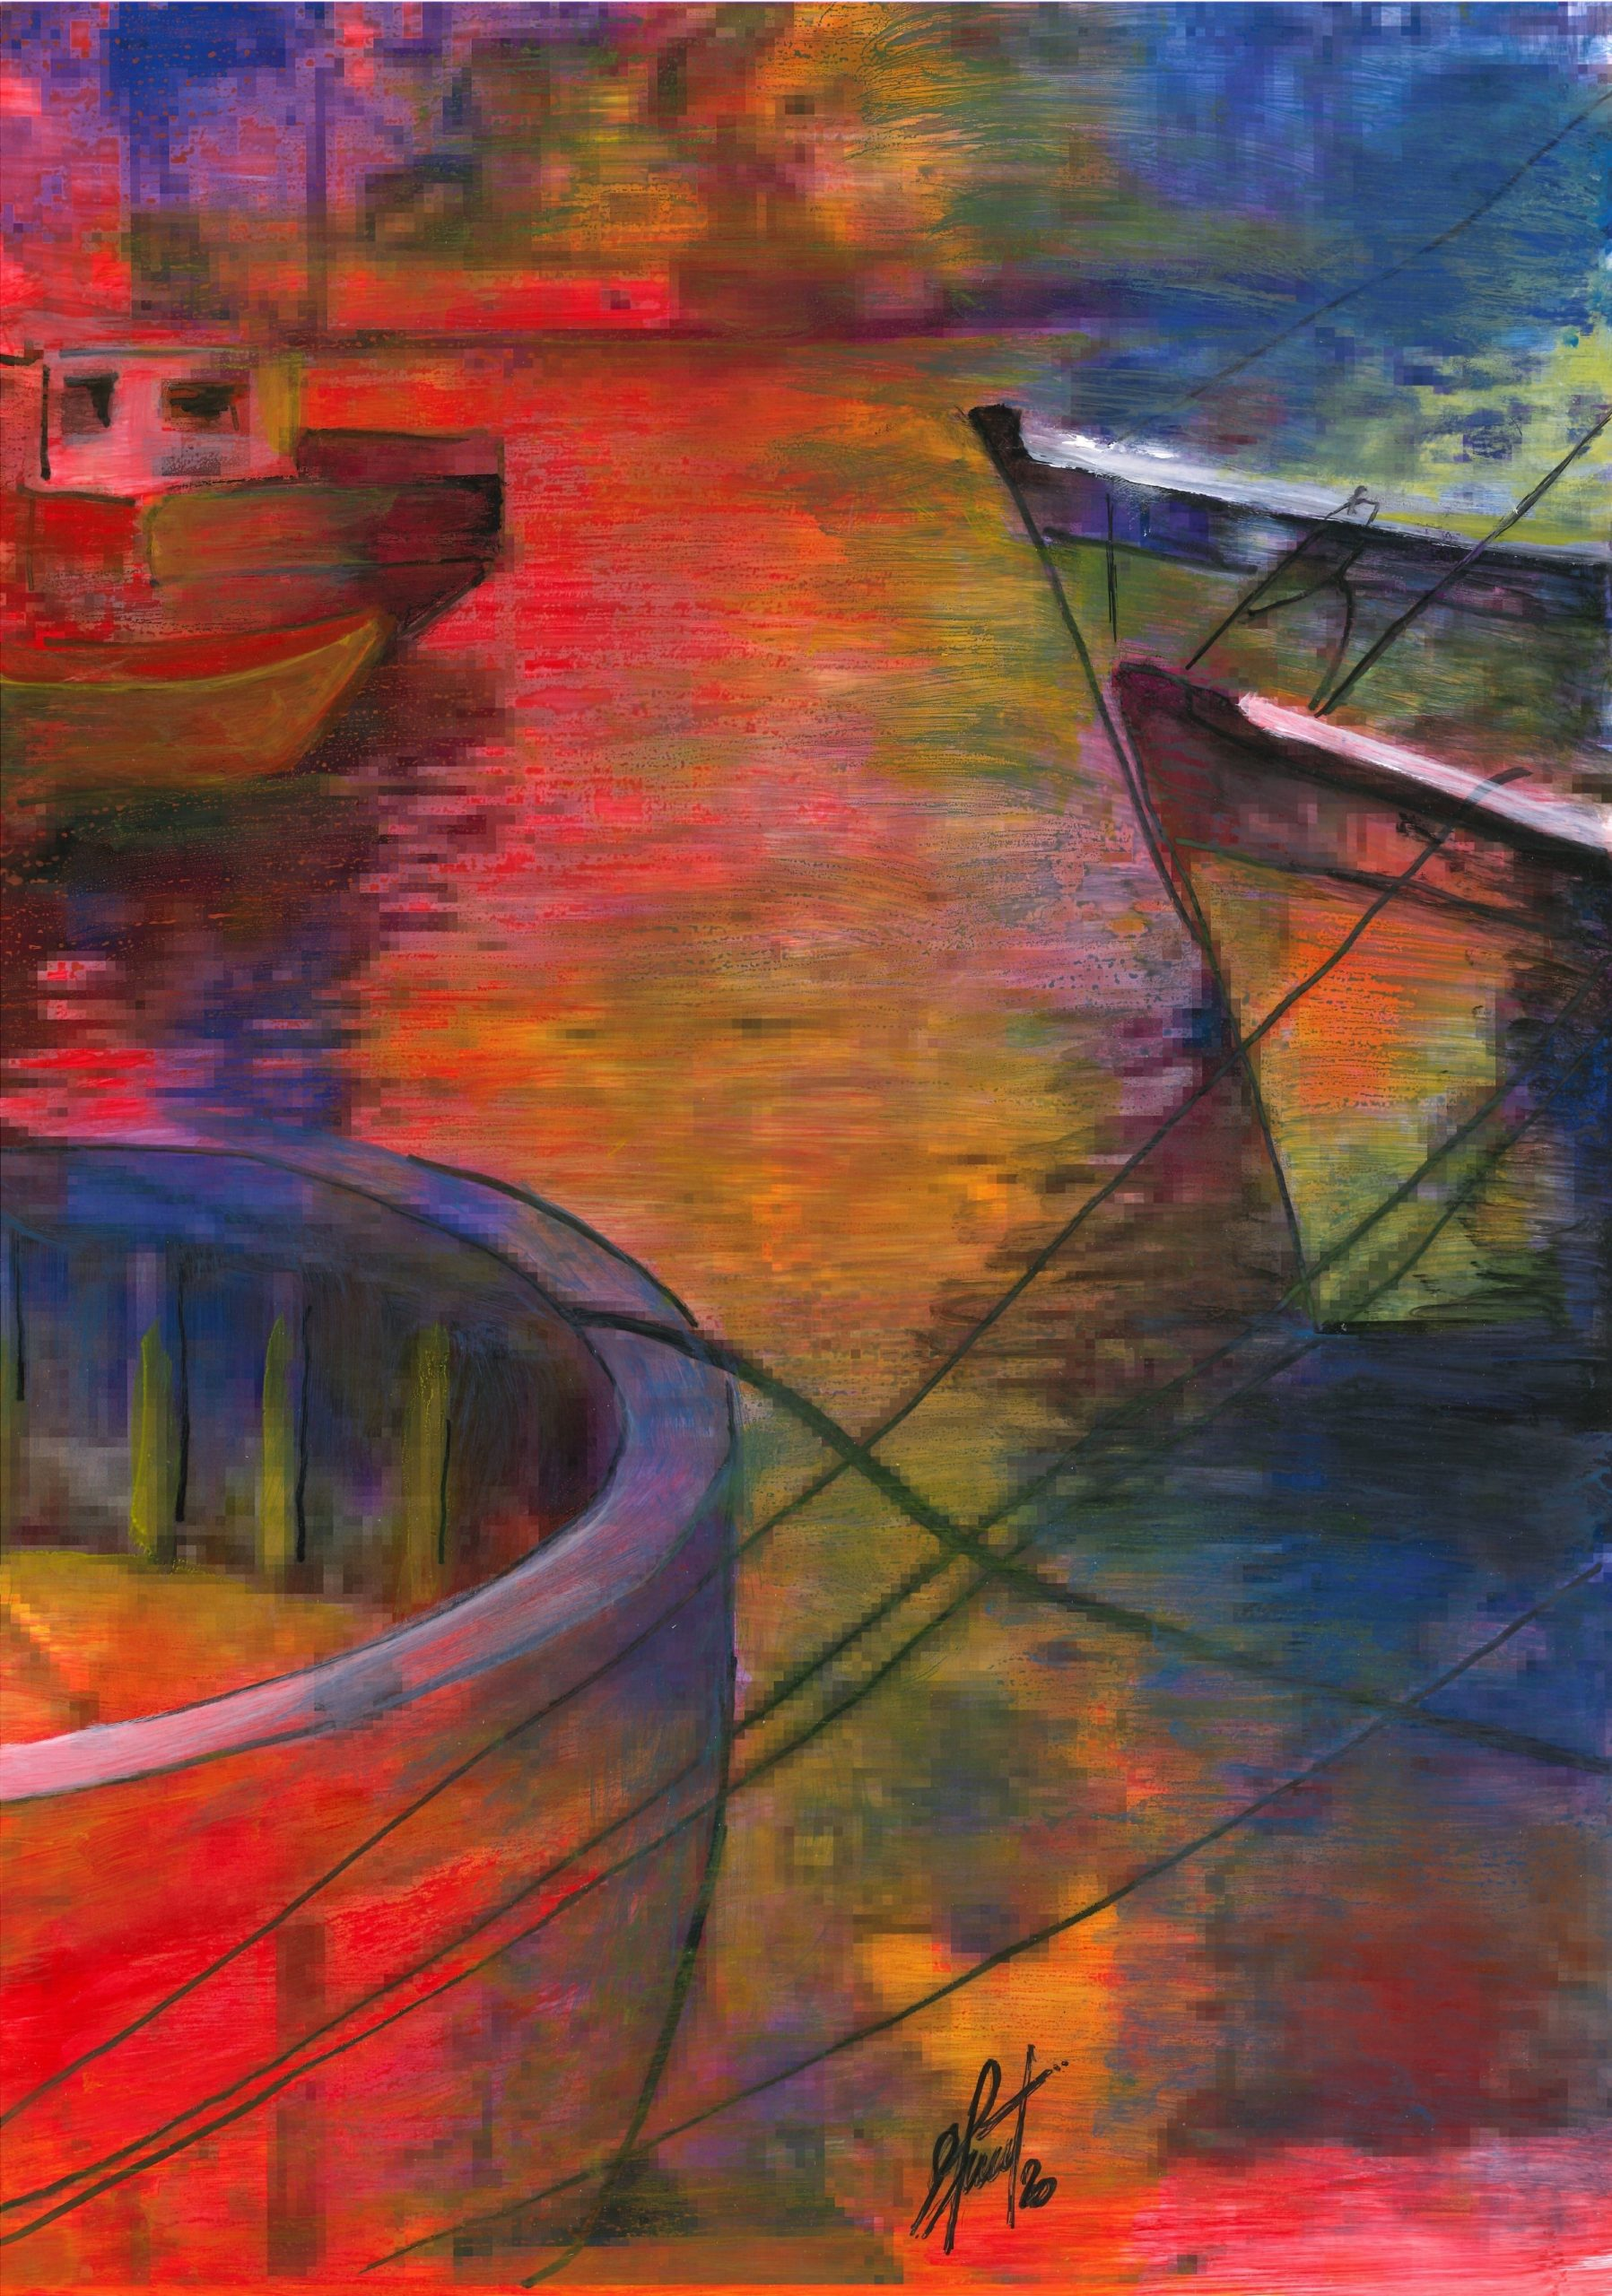 Adriana Furstner | Serie Arte digital. Pixeles, explosión a todo color. Arte digital intervenido con acrílico sobre papel. 39,5 x 28 cm. 2020